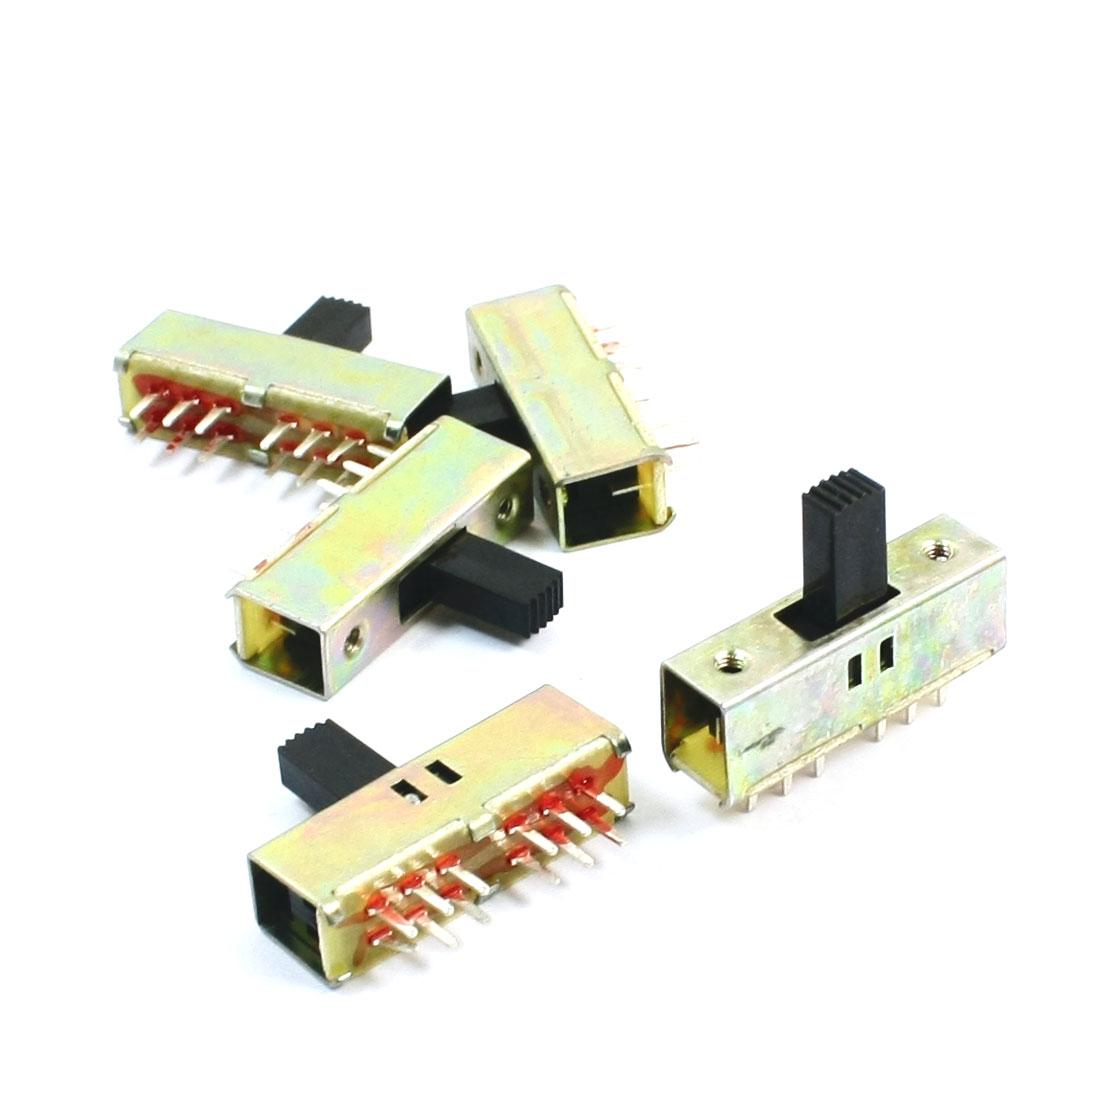 5Pcs 11mm High Side Knob 12Pin 2 Position 4PDT Slide Switch 0.5A AC50V